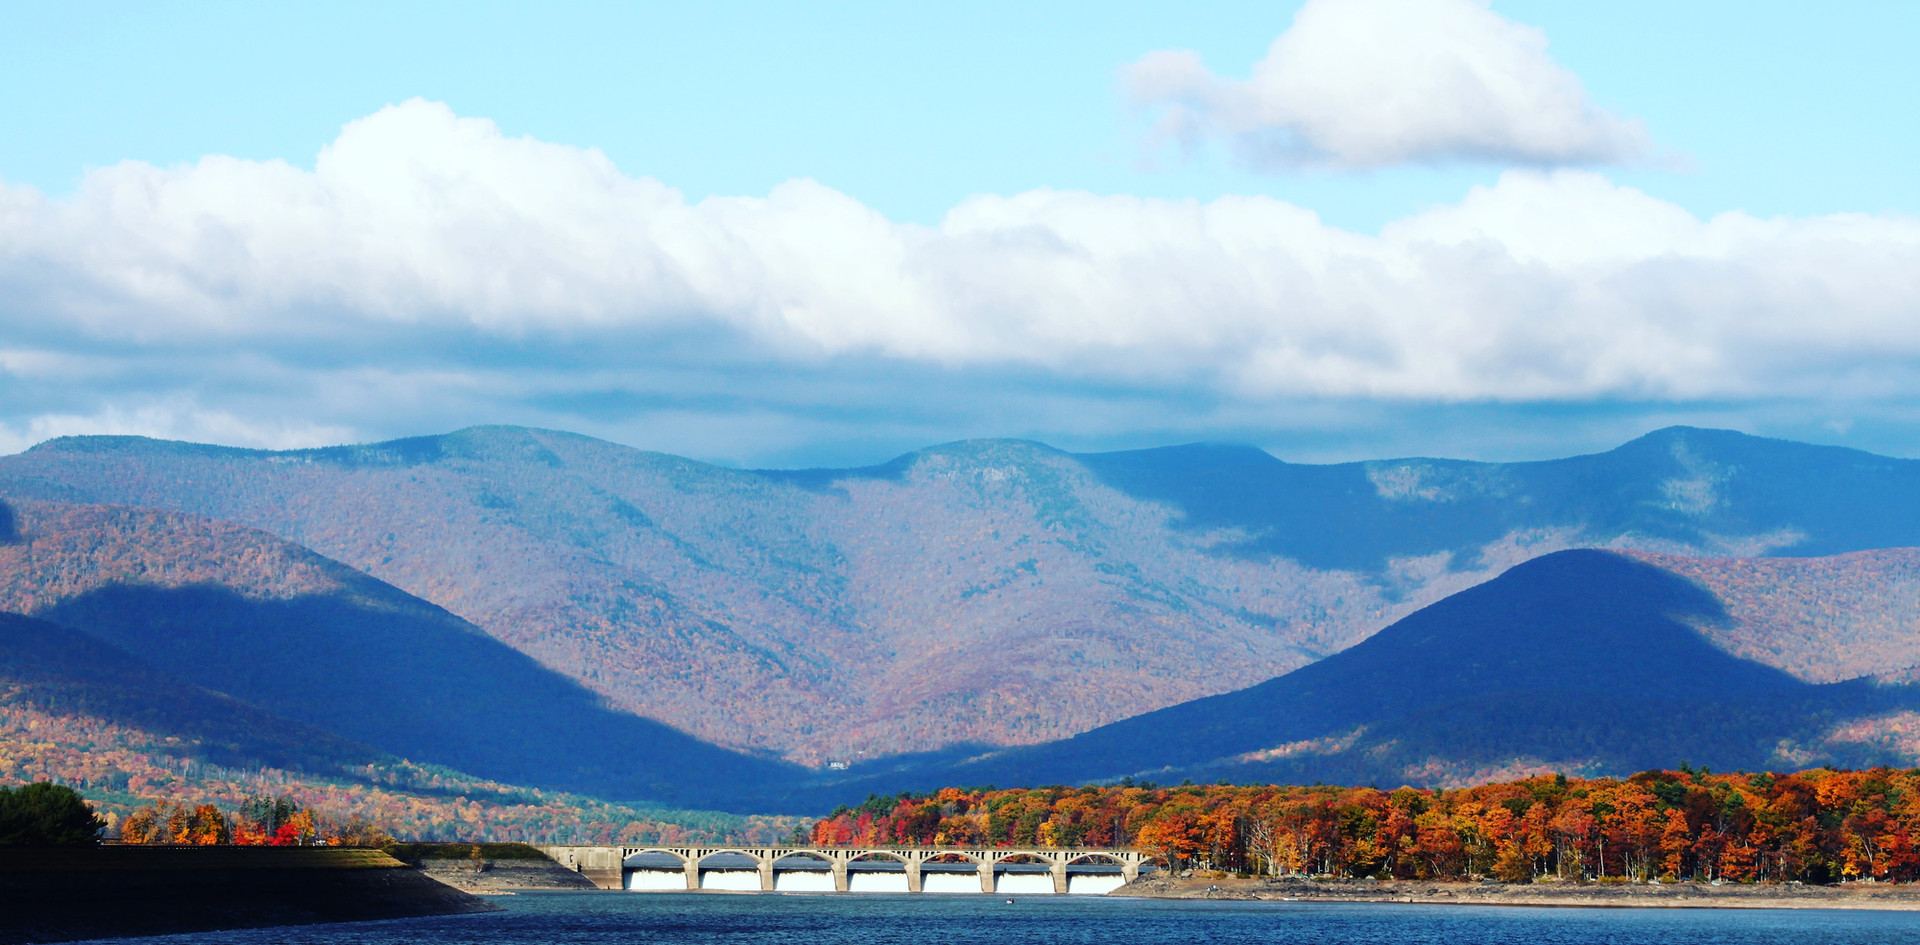 The Ashokan Reservoir